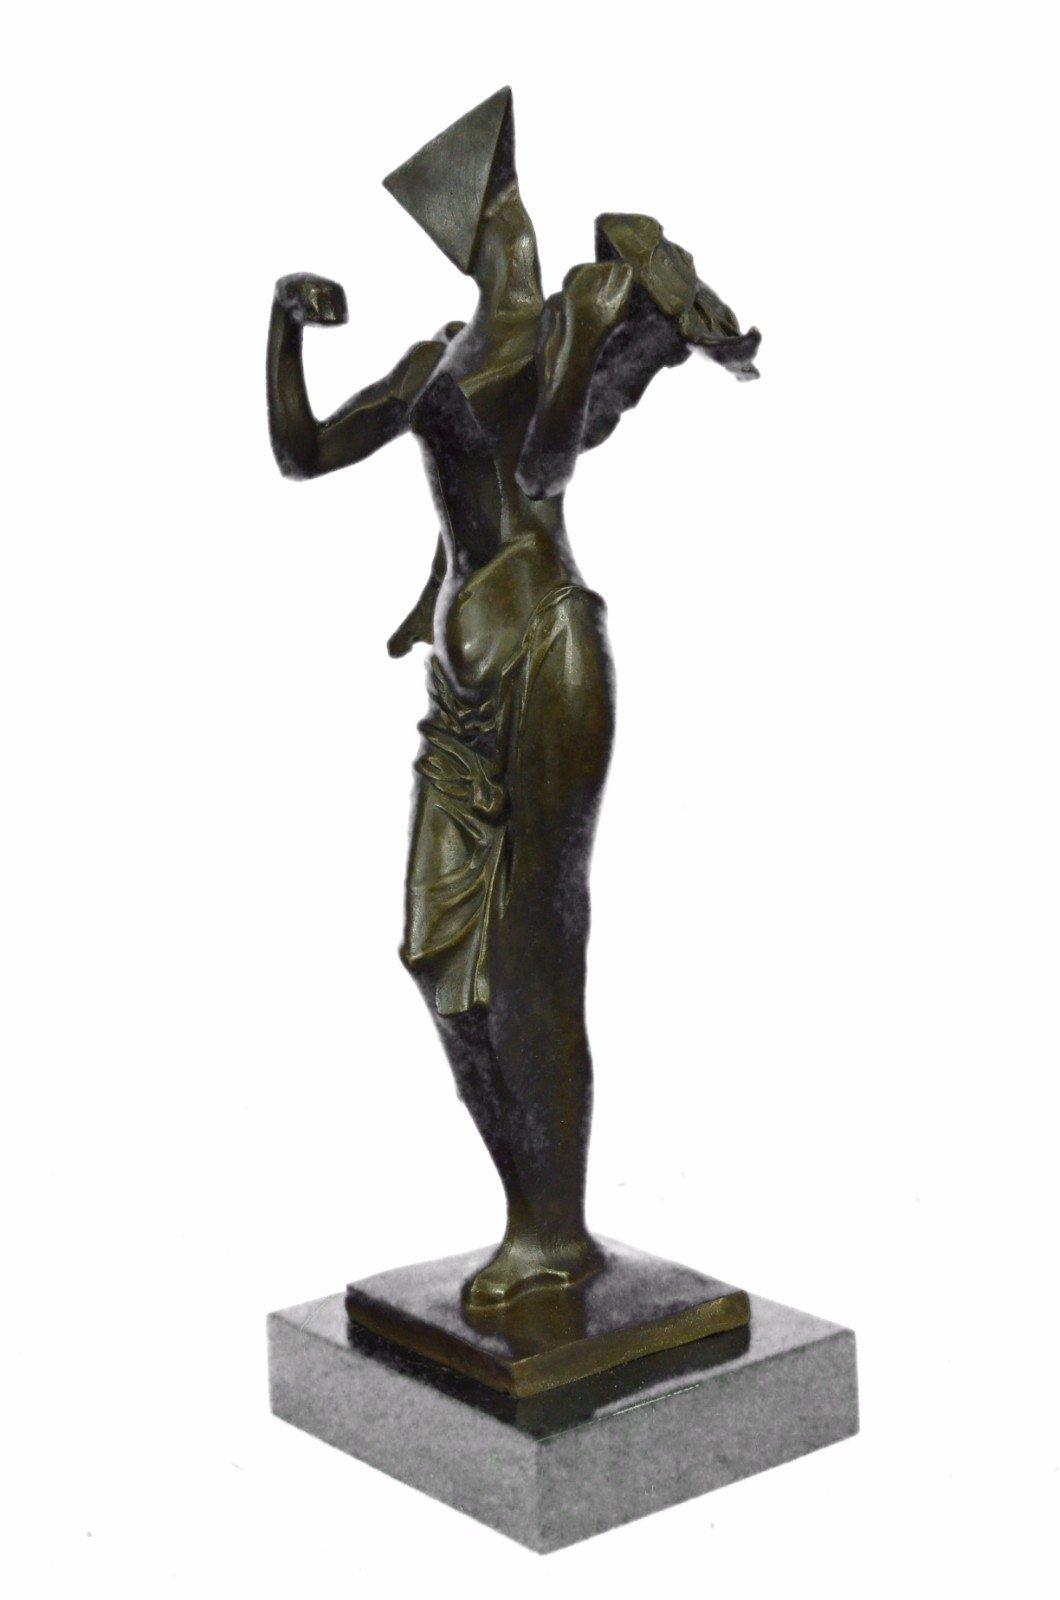 Handmade European Bronze Sculpture Salvator Dali Surrealistic Angel Abstract Modern Art Art Bronze Statue -UKXN-2546-Decor Collectible Gift by Bronzioni (Image #2)